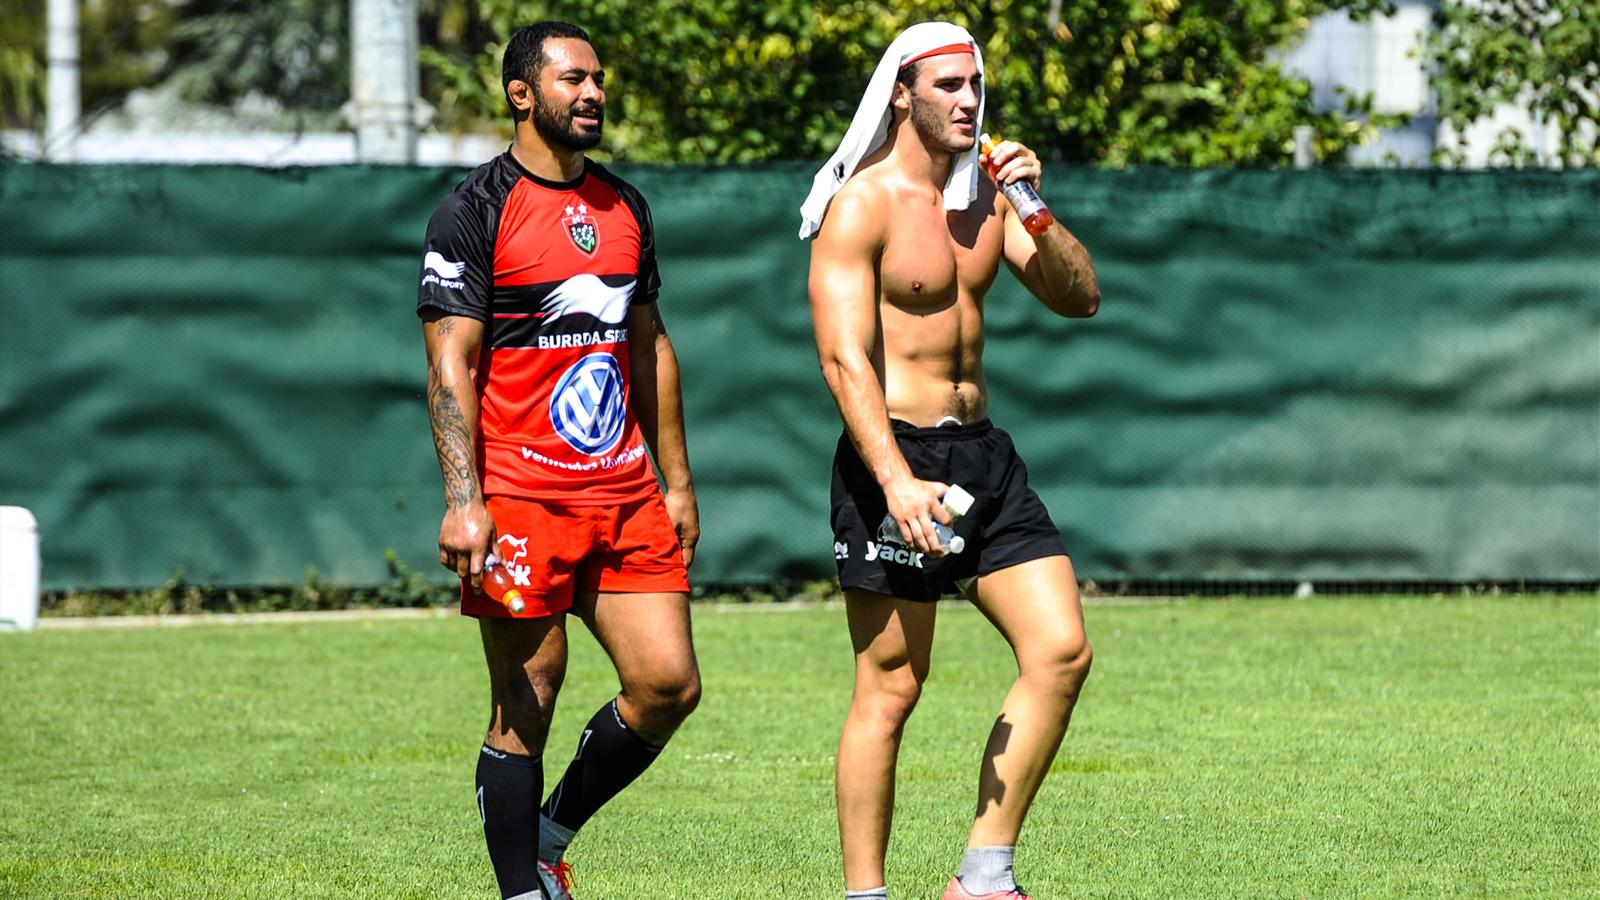 Samu Manoa et Charles Ollivon (Toulon) - 9 juillet 2015